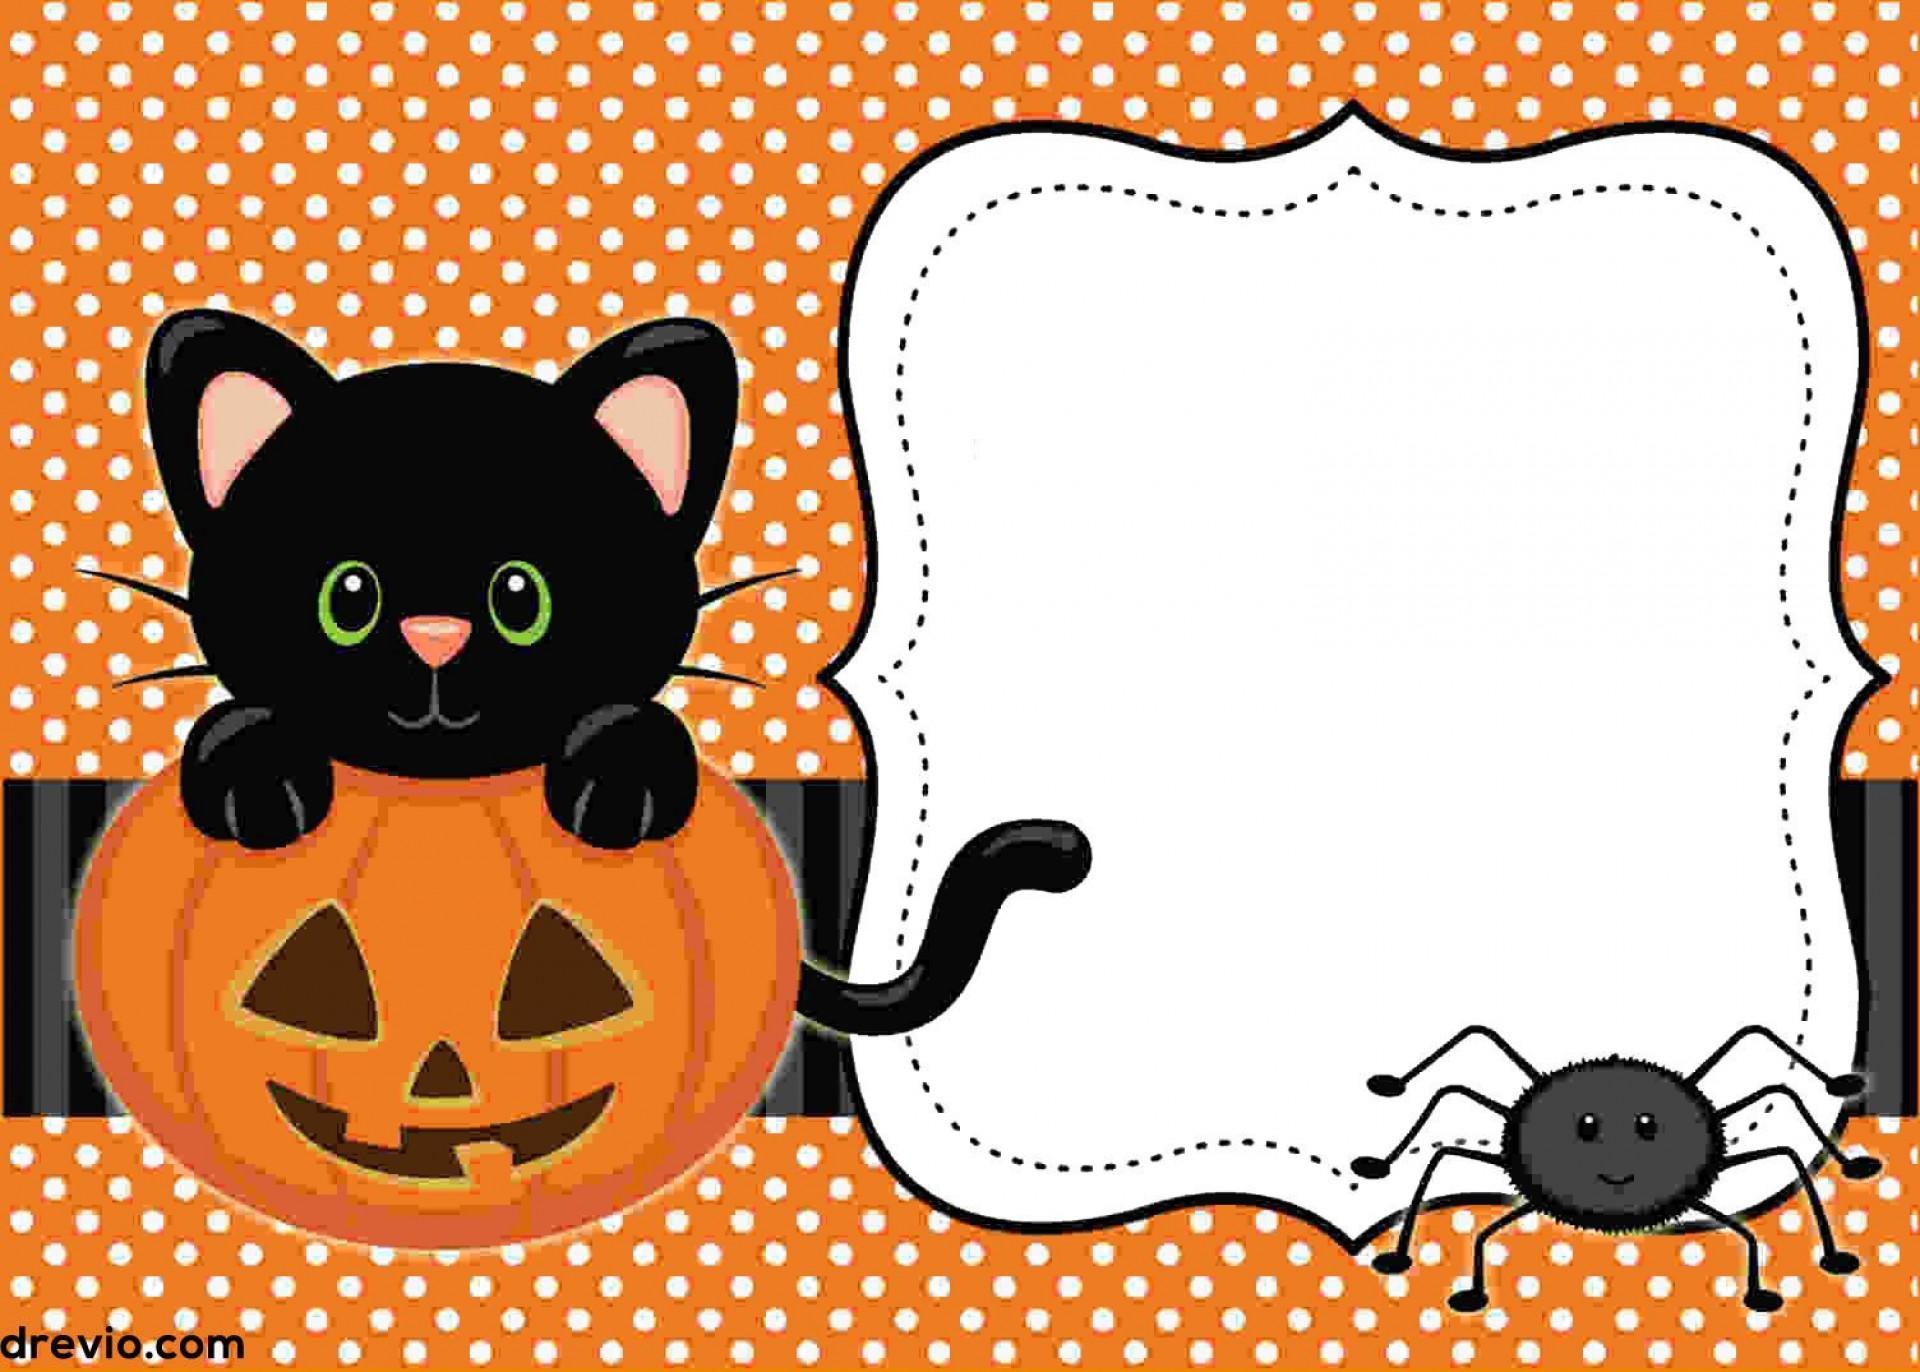 002 Awful Free Halloween Invitation Template Idea  Templates Microsoft Word Wedding Printable Party1920